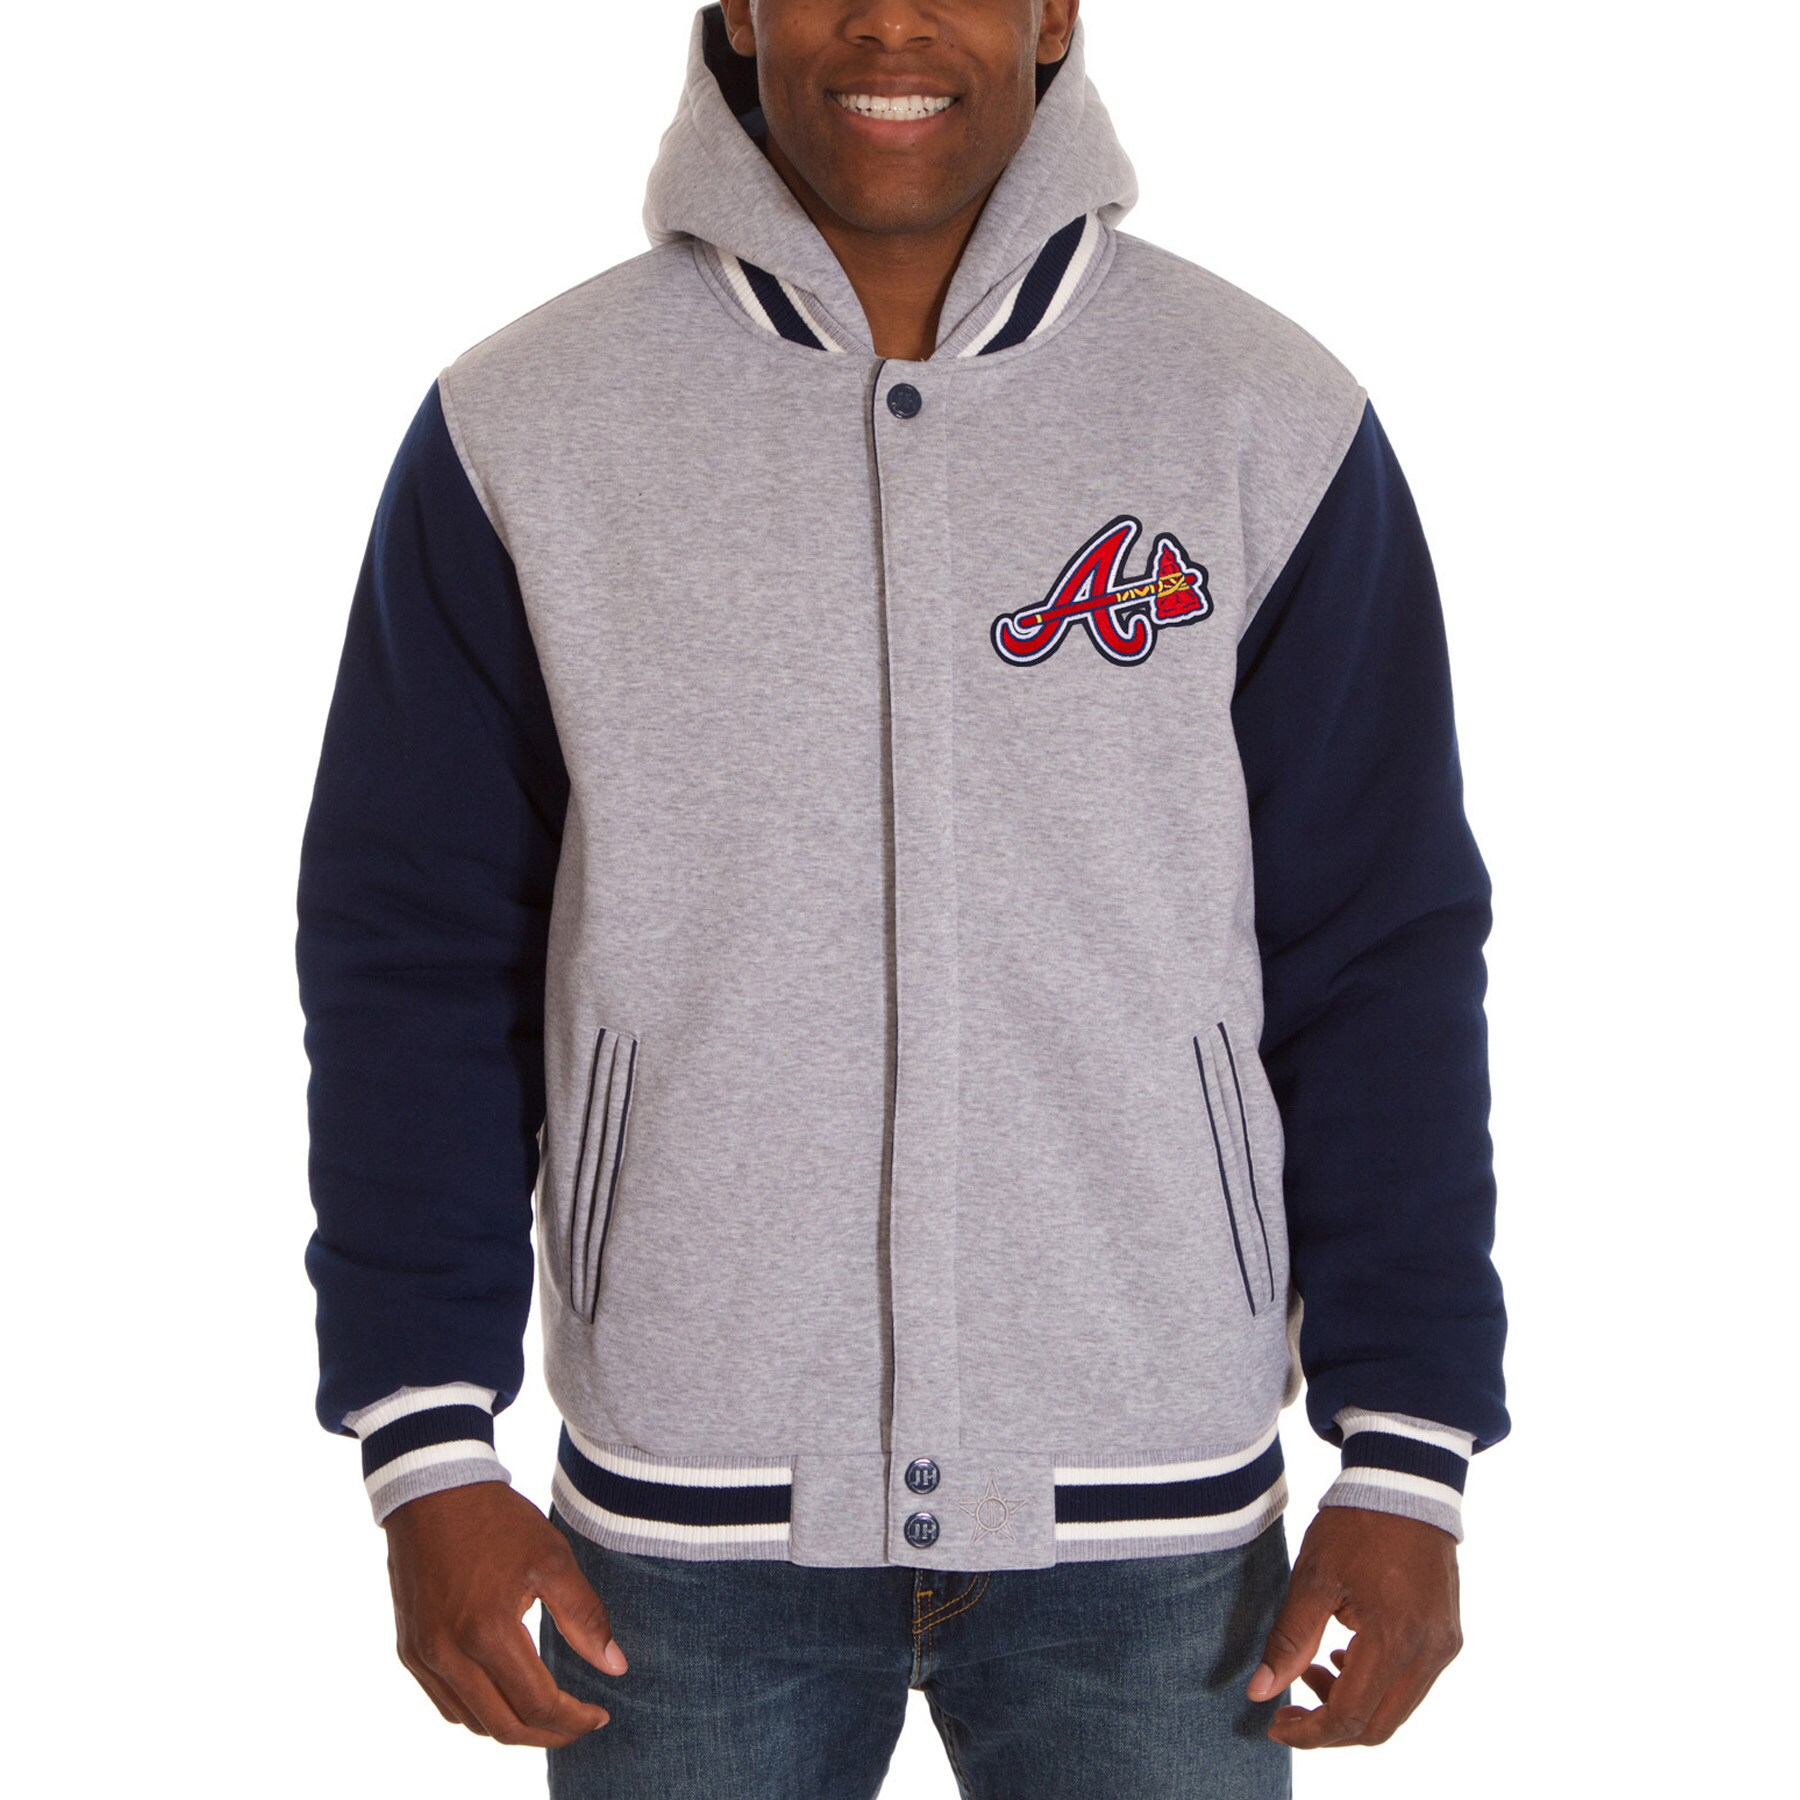 Atlanta Braves JH Design Reversible Fleece Full Snap Hoodie - Gray